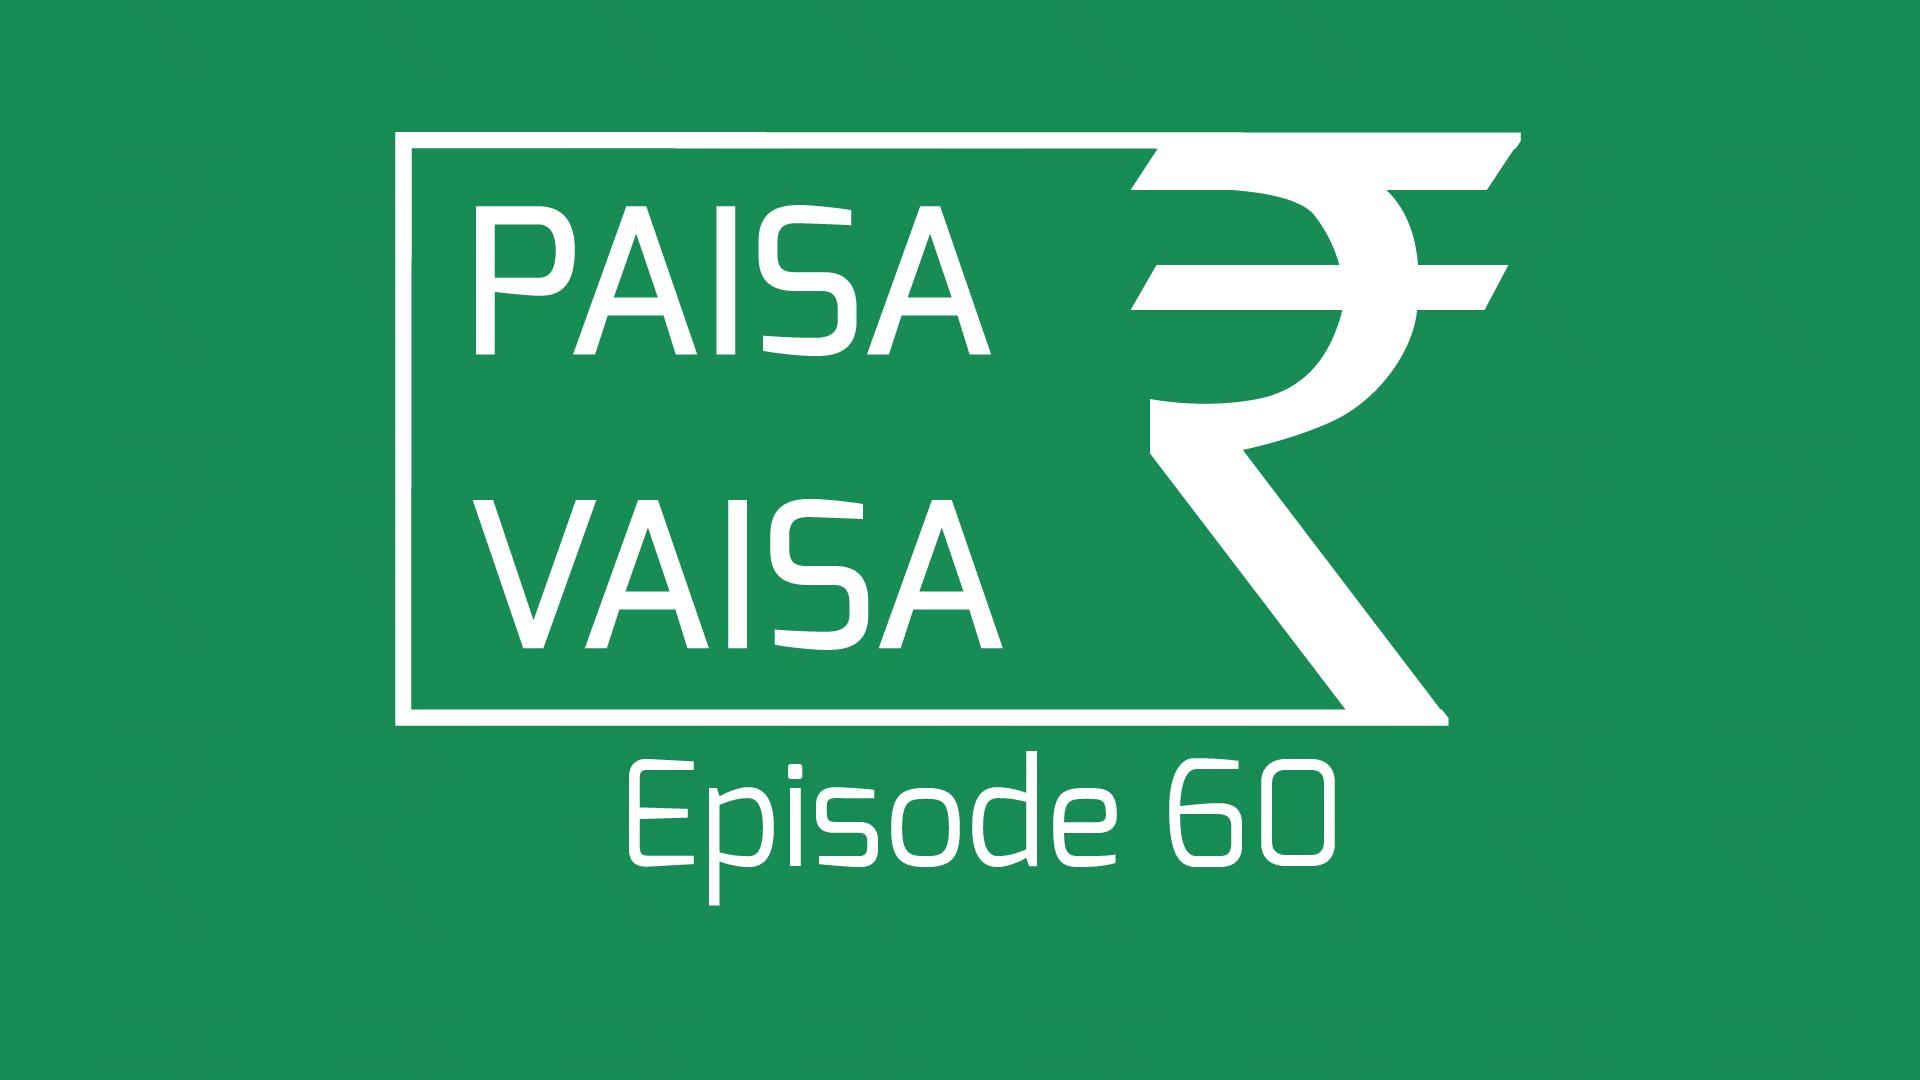 PaisaVaisaEpisode60.png